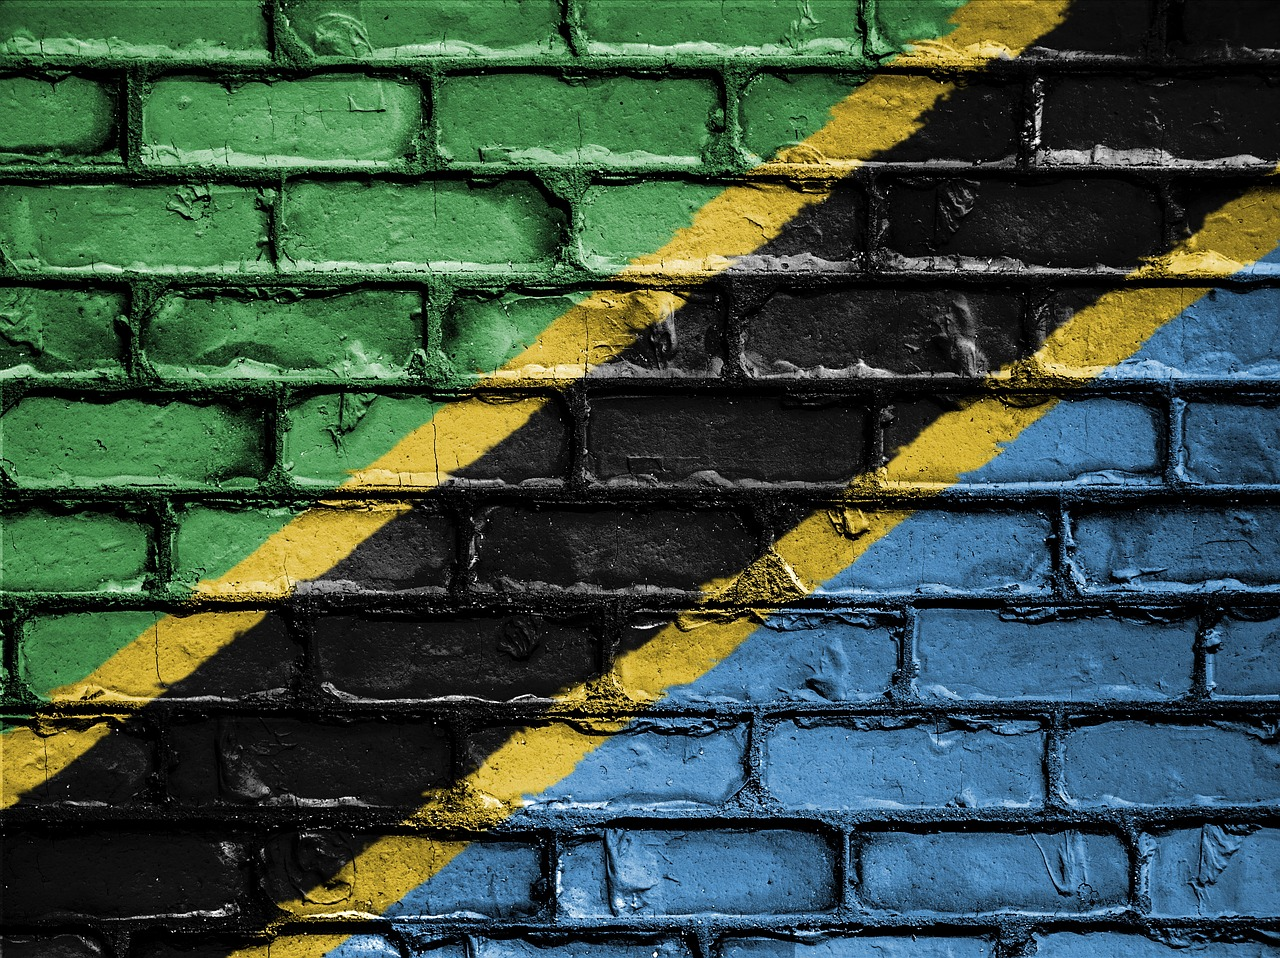 Tanzania president lifts media ban